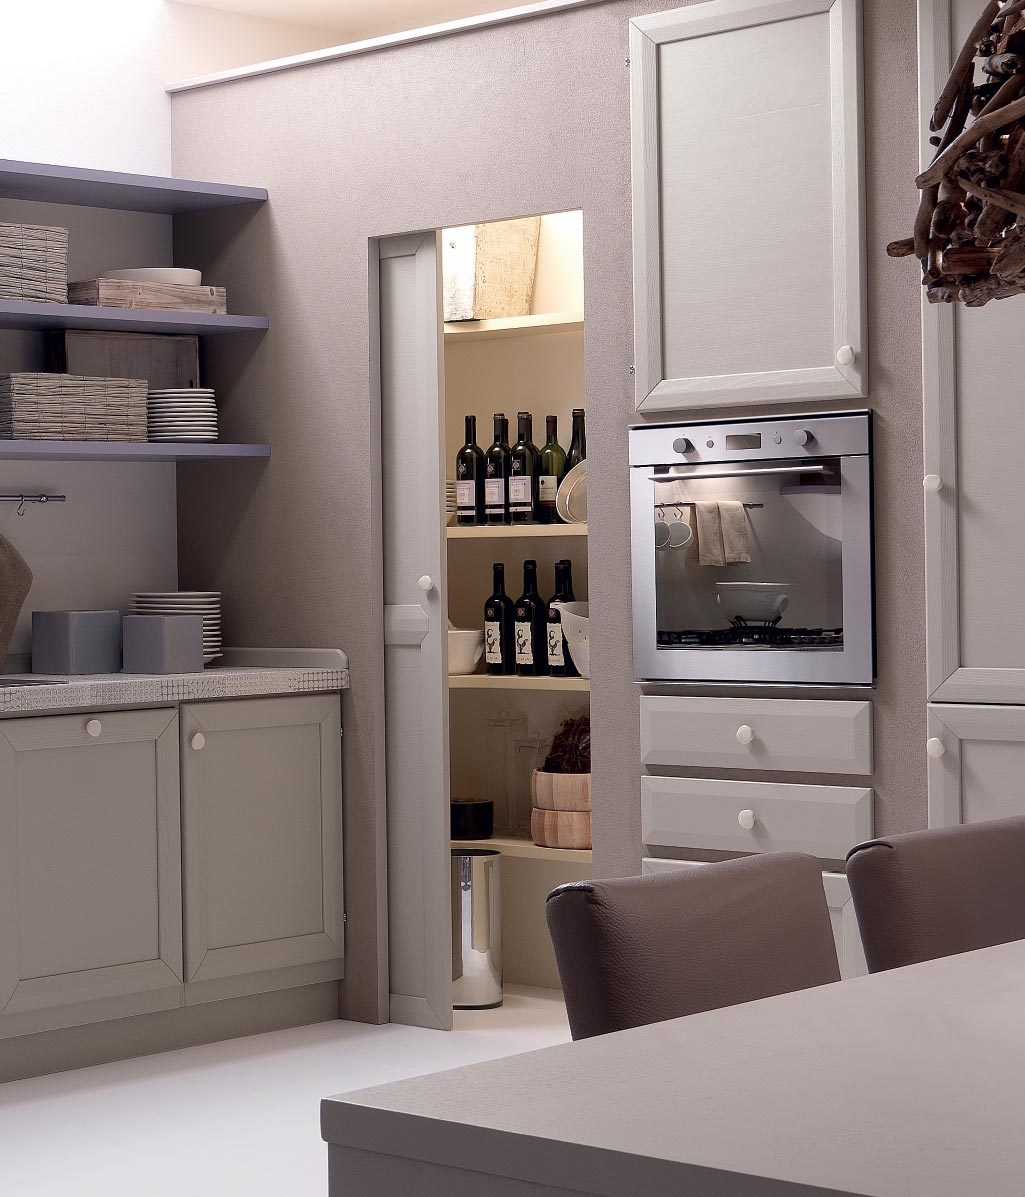 Cucine complete stosa - Cucine moderne in legno ...